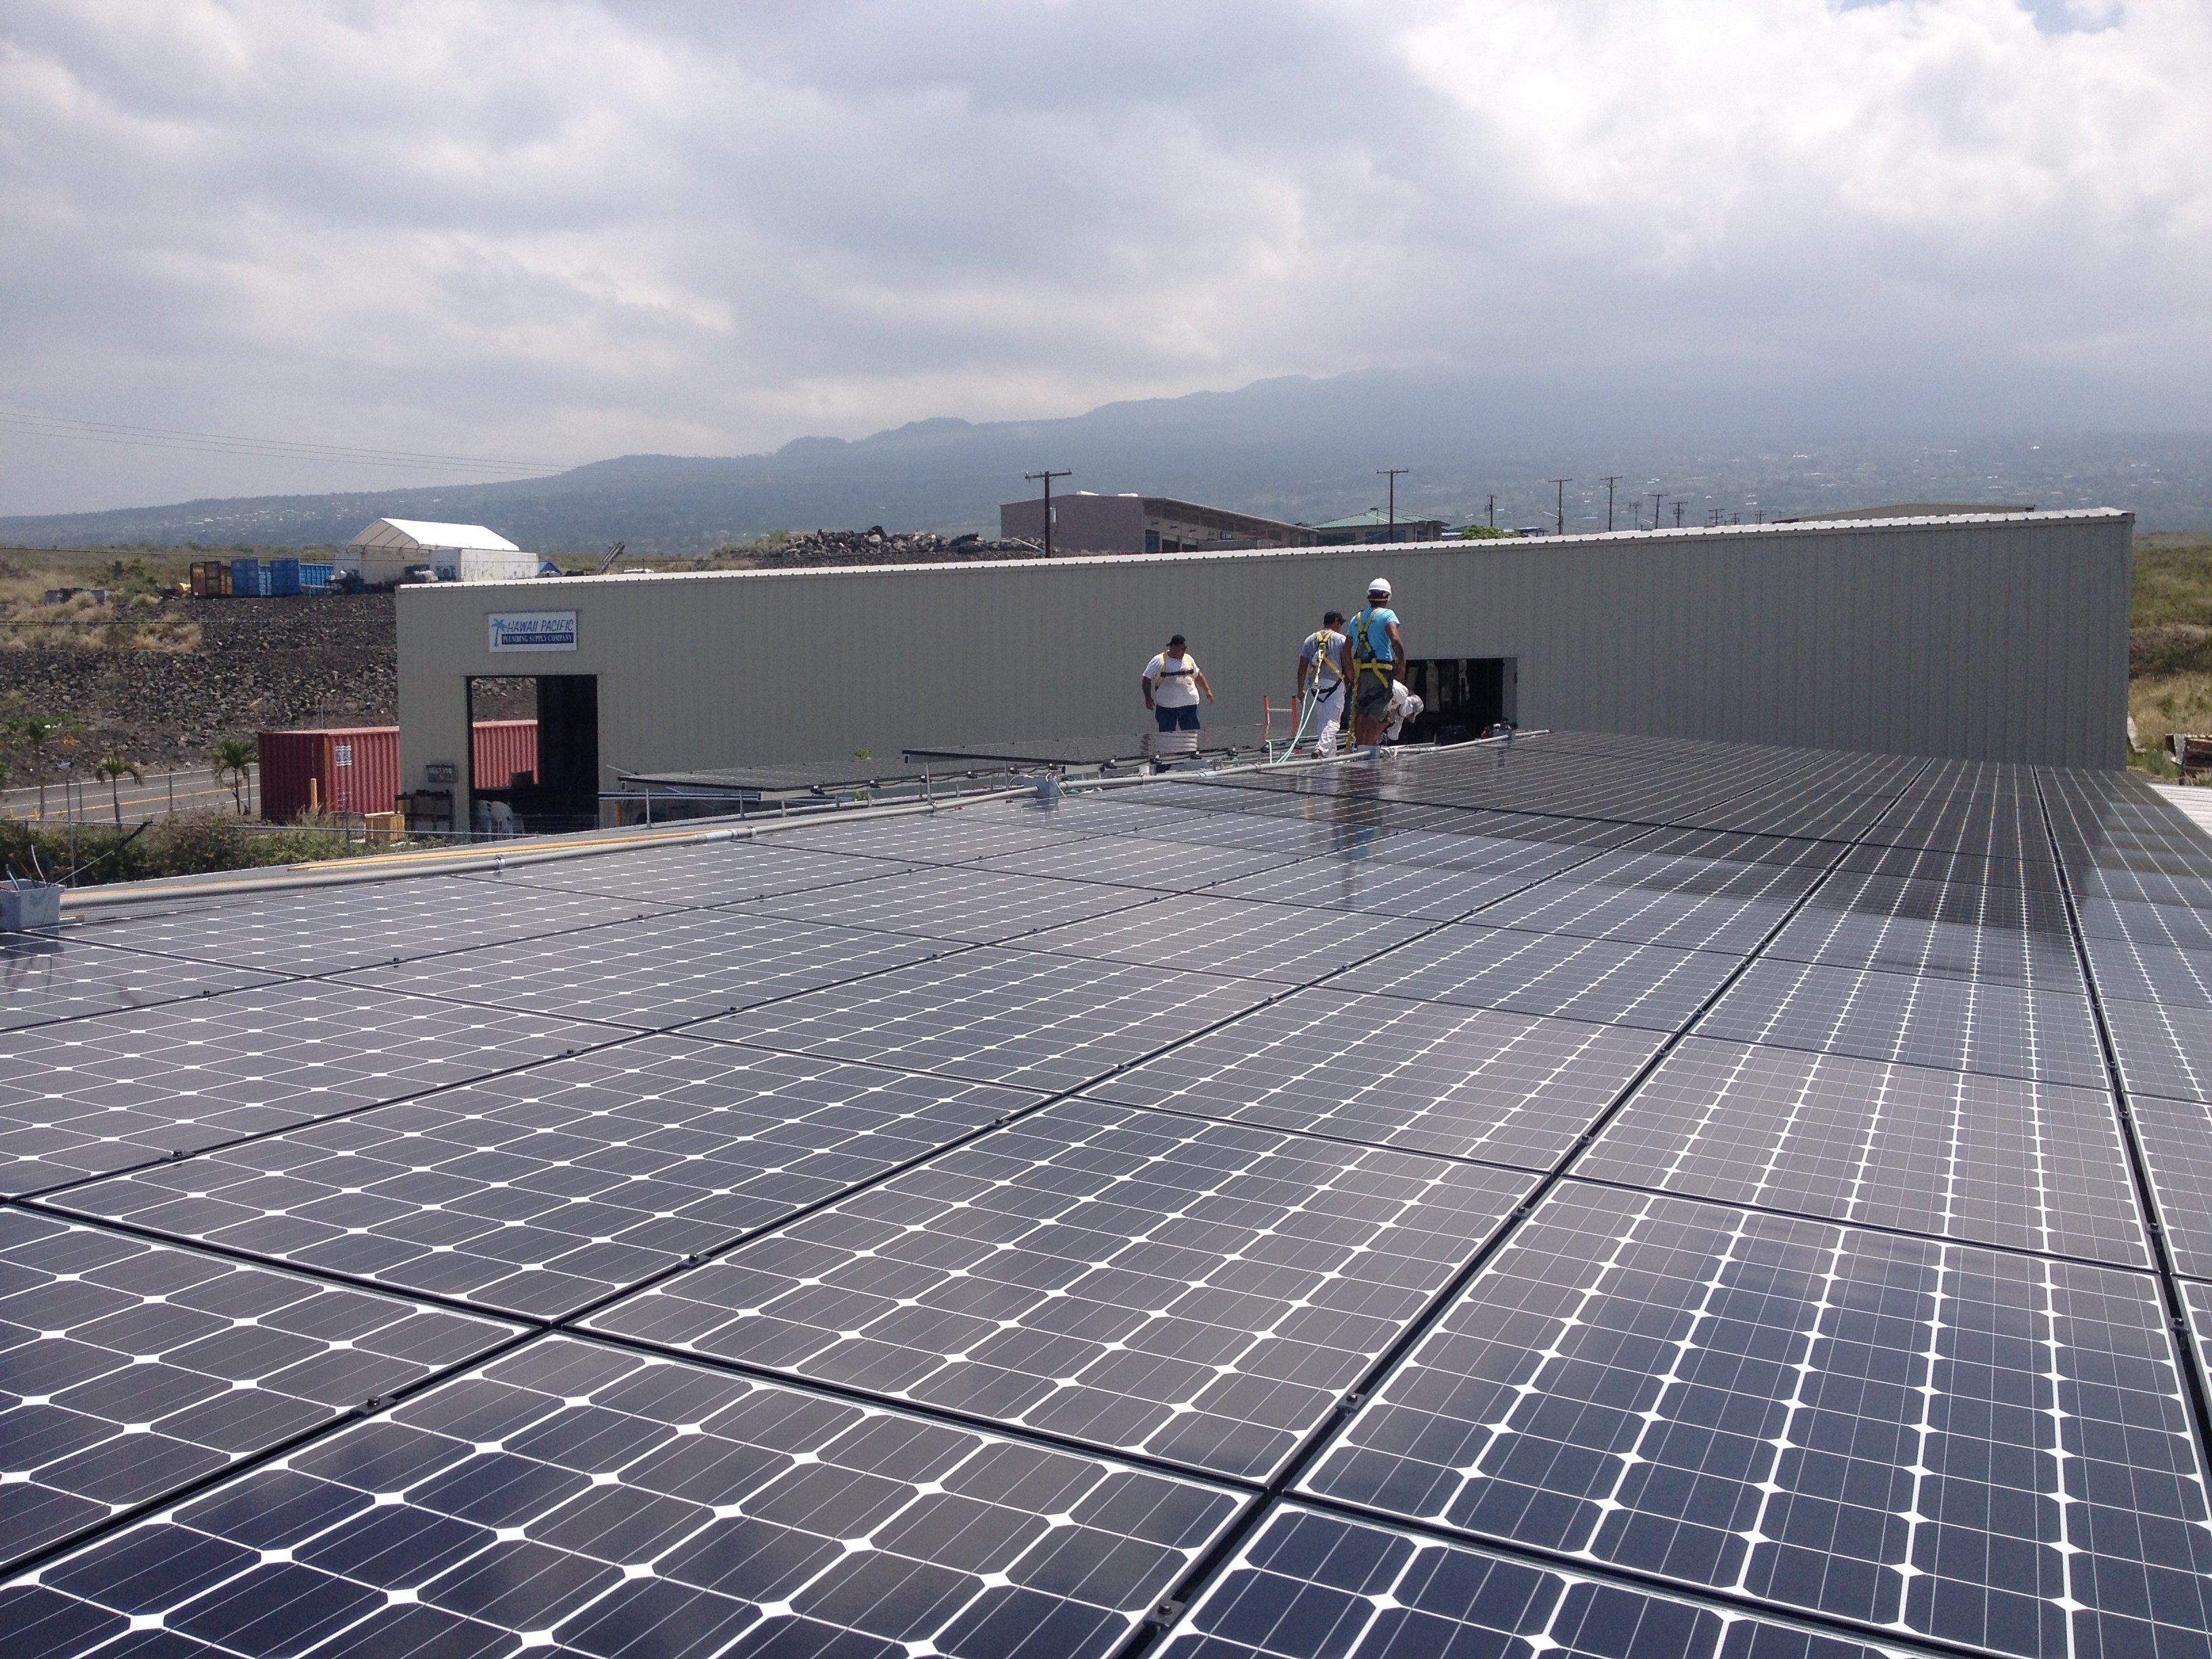 Jack Tours installed 30.6 KW solar power system in Honokaa, HI